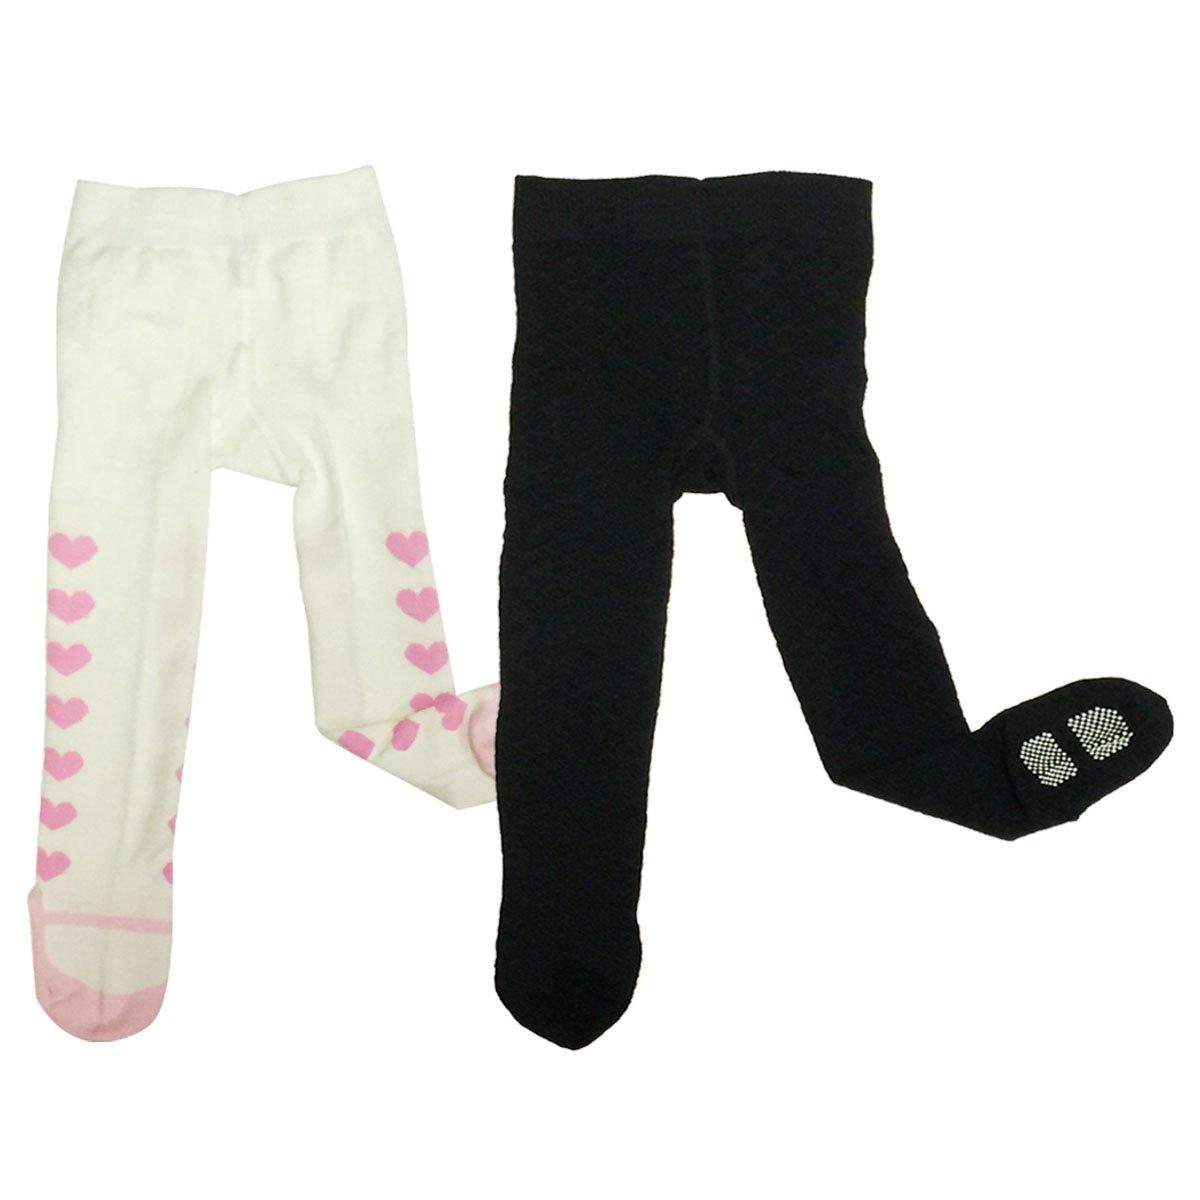 Bowbear Toddler Girl 2-Pair Non-Slip Tights Mary Janes /& Cross Pattern